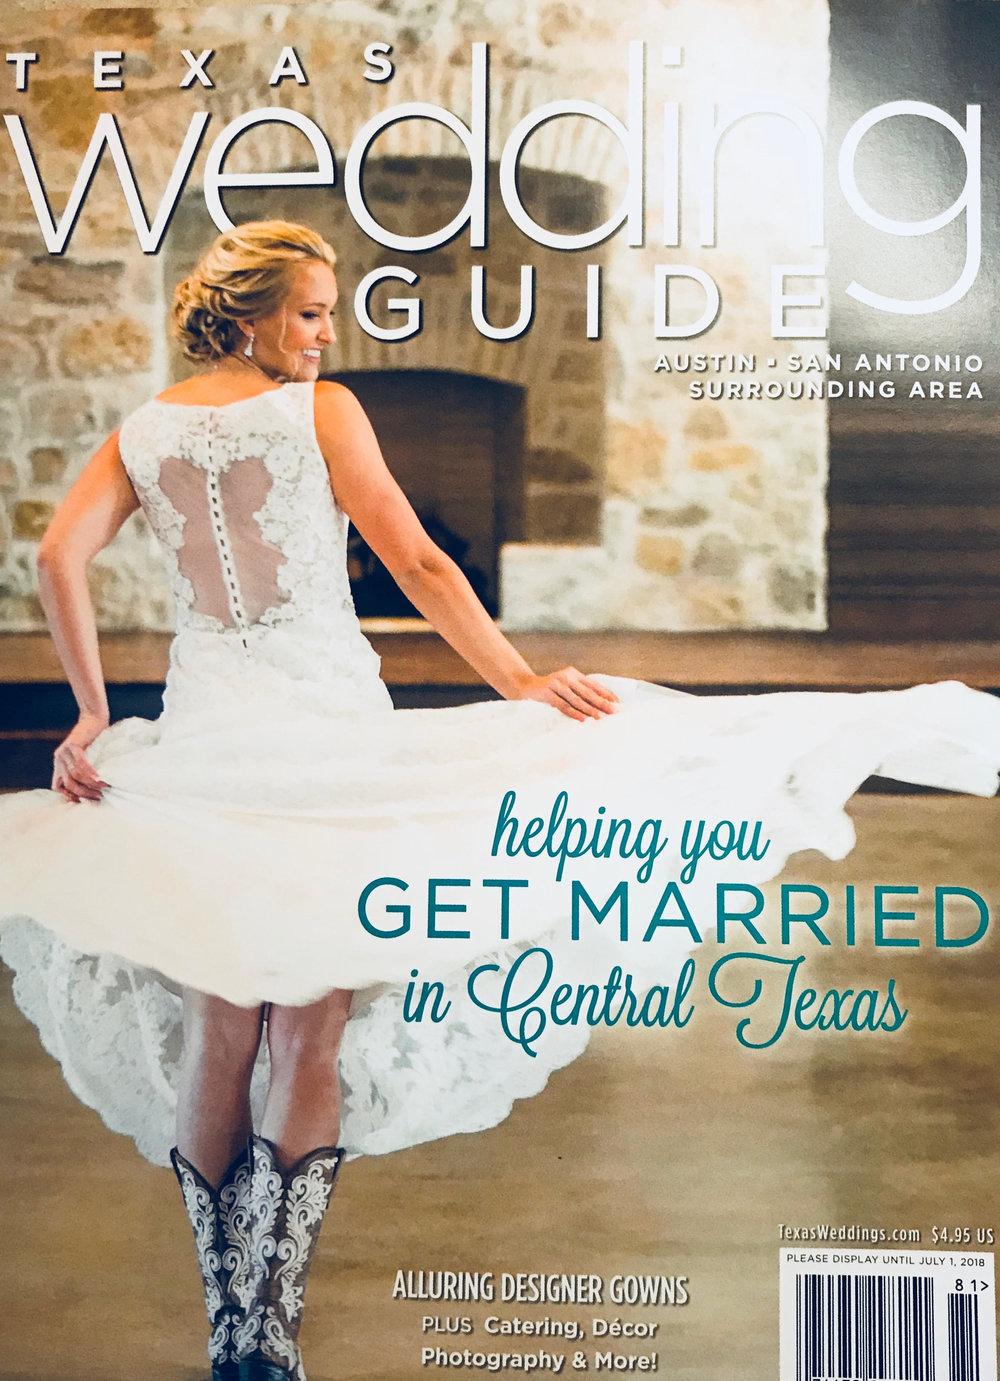 Texas Wedding Guide - PSR - LUXURY CAKES & DESIGNED DESSERTS